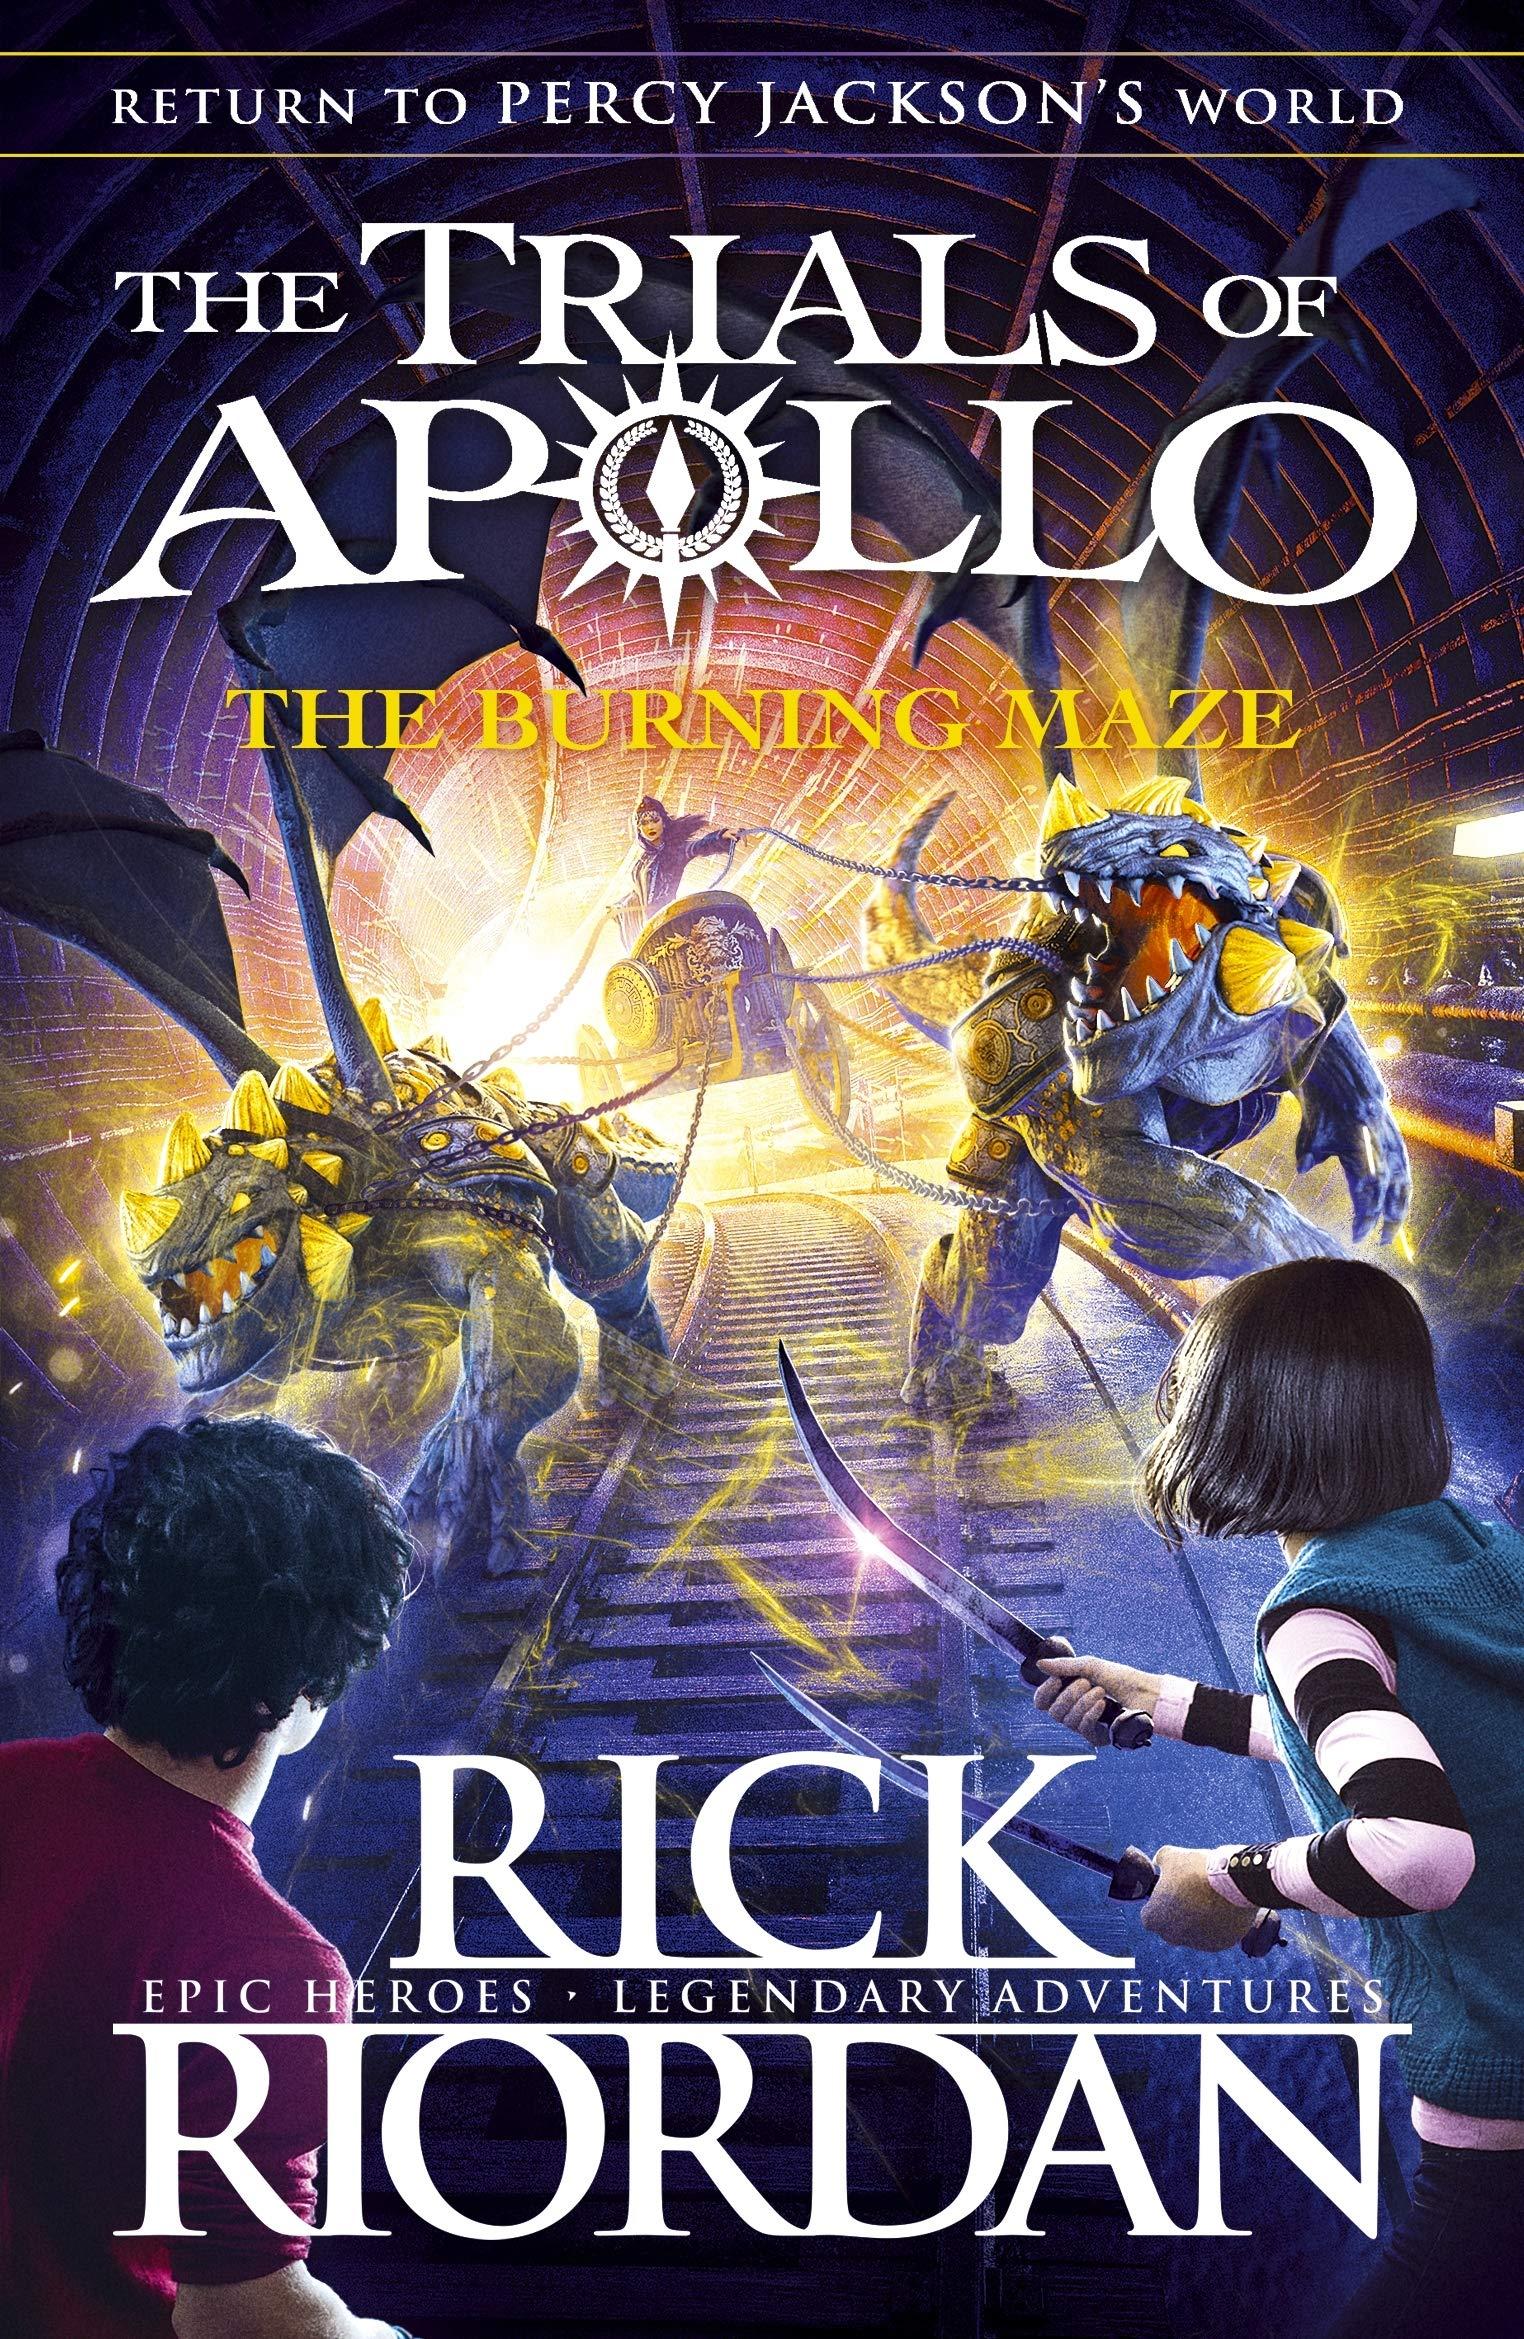 Burning Maze (The Trials of Apollo Book 3) - 9780141364018